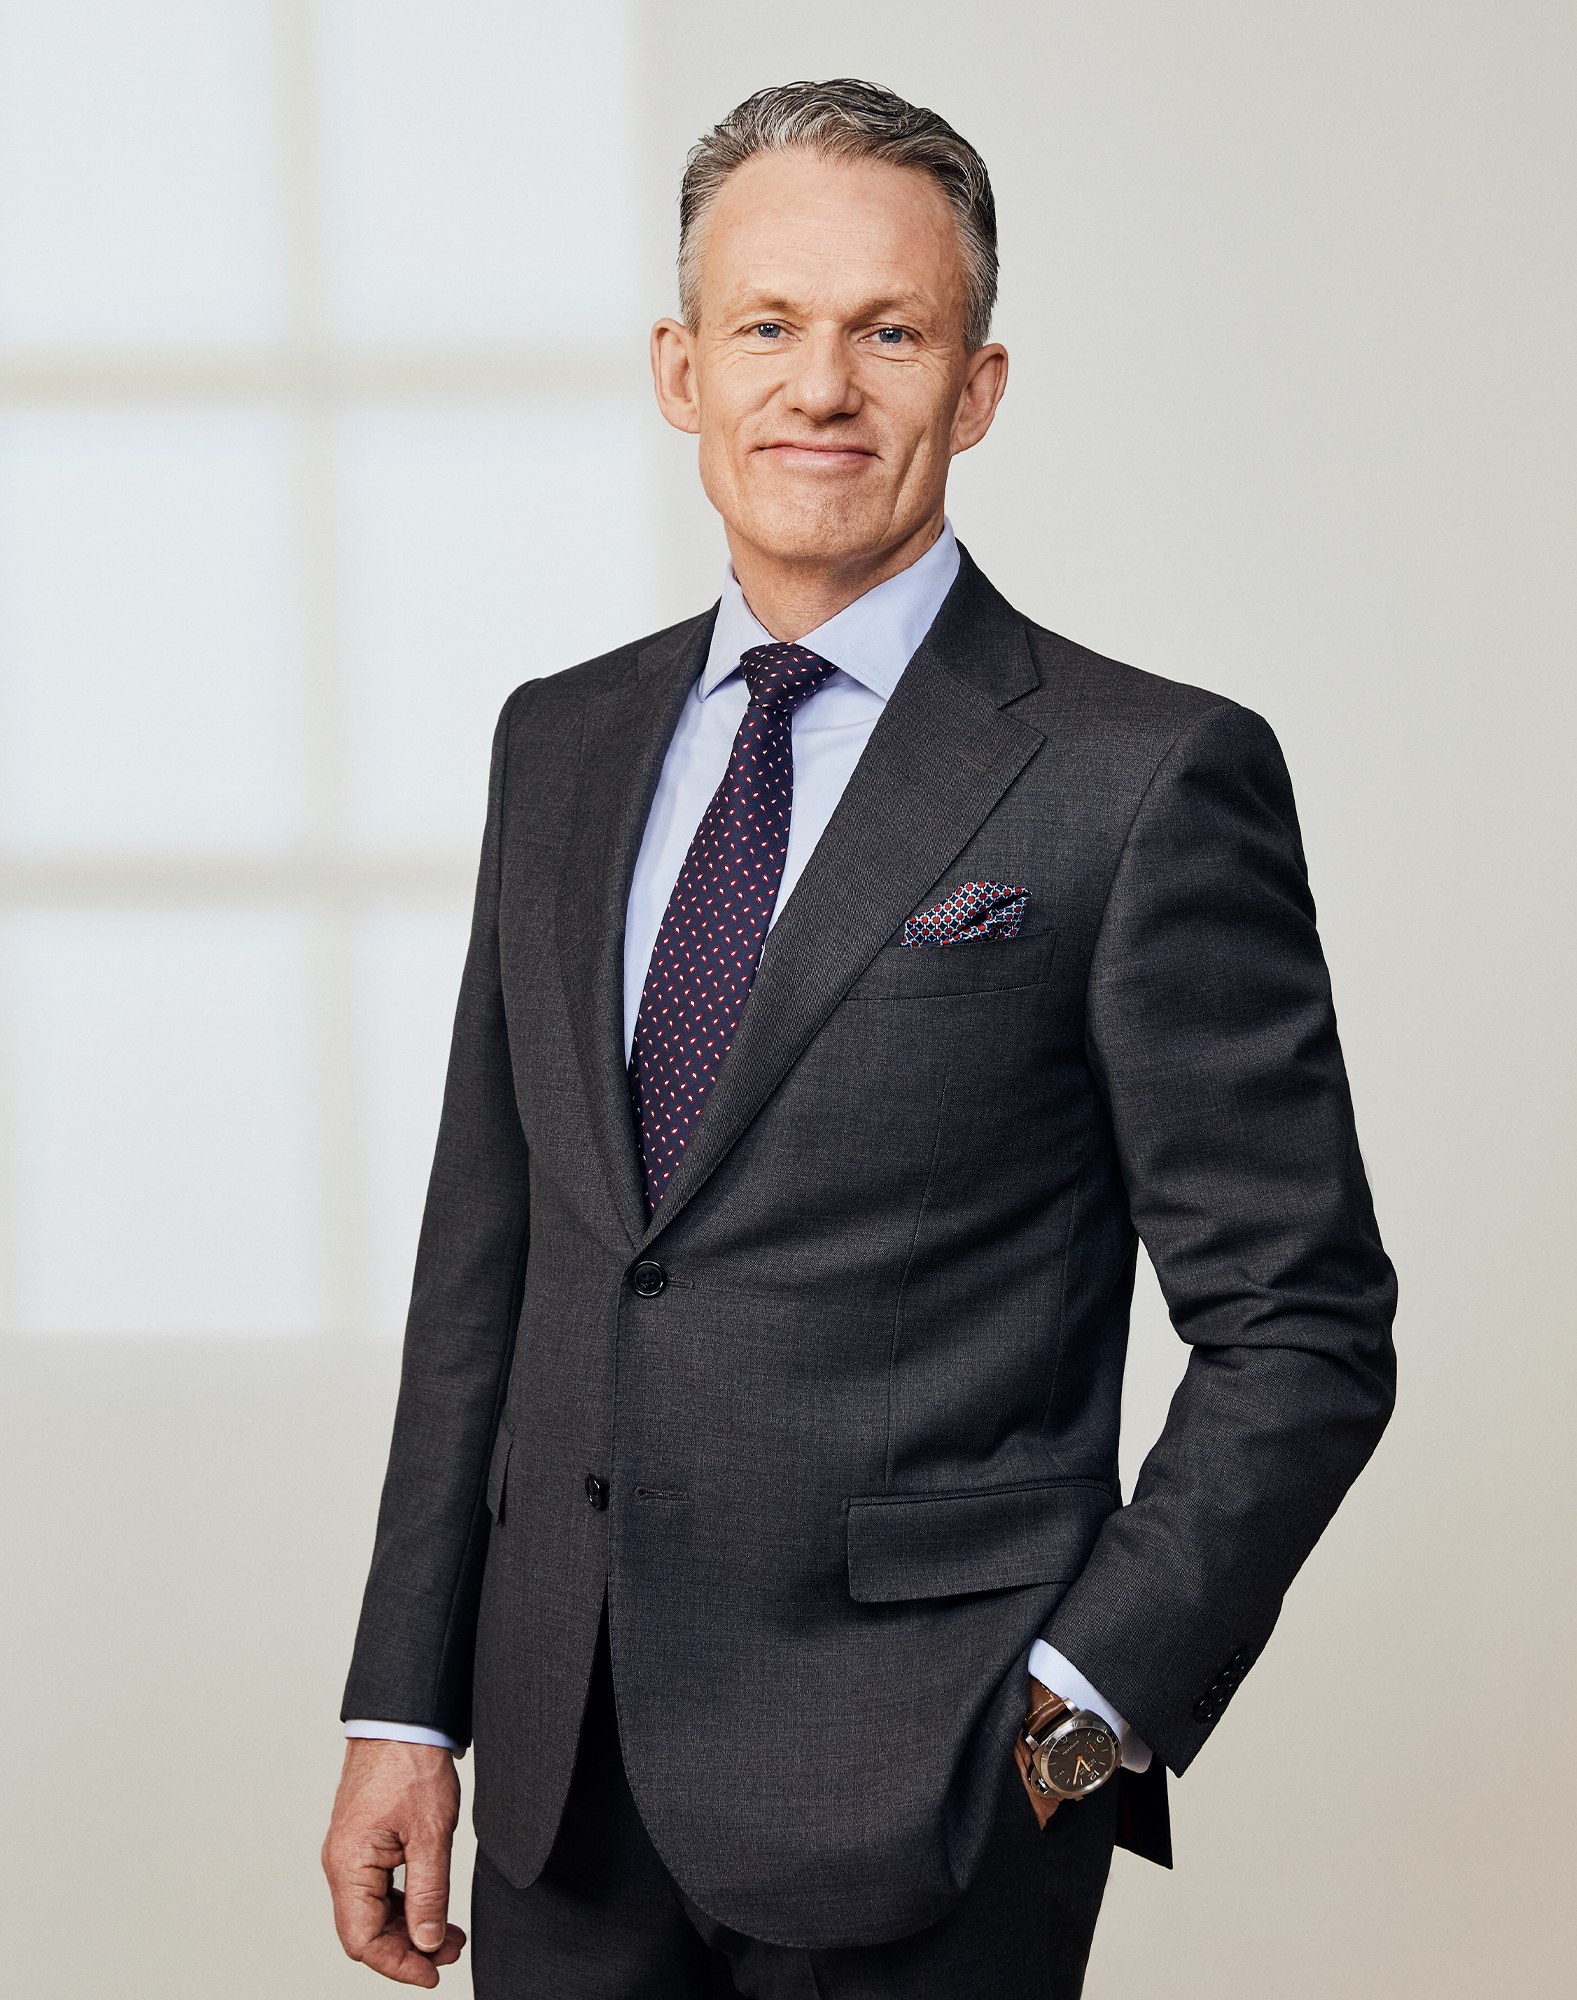 Nils Olav Aarseth